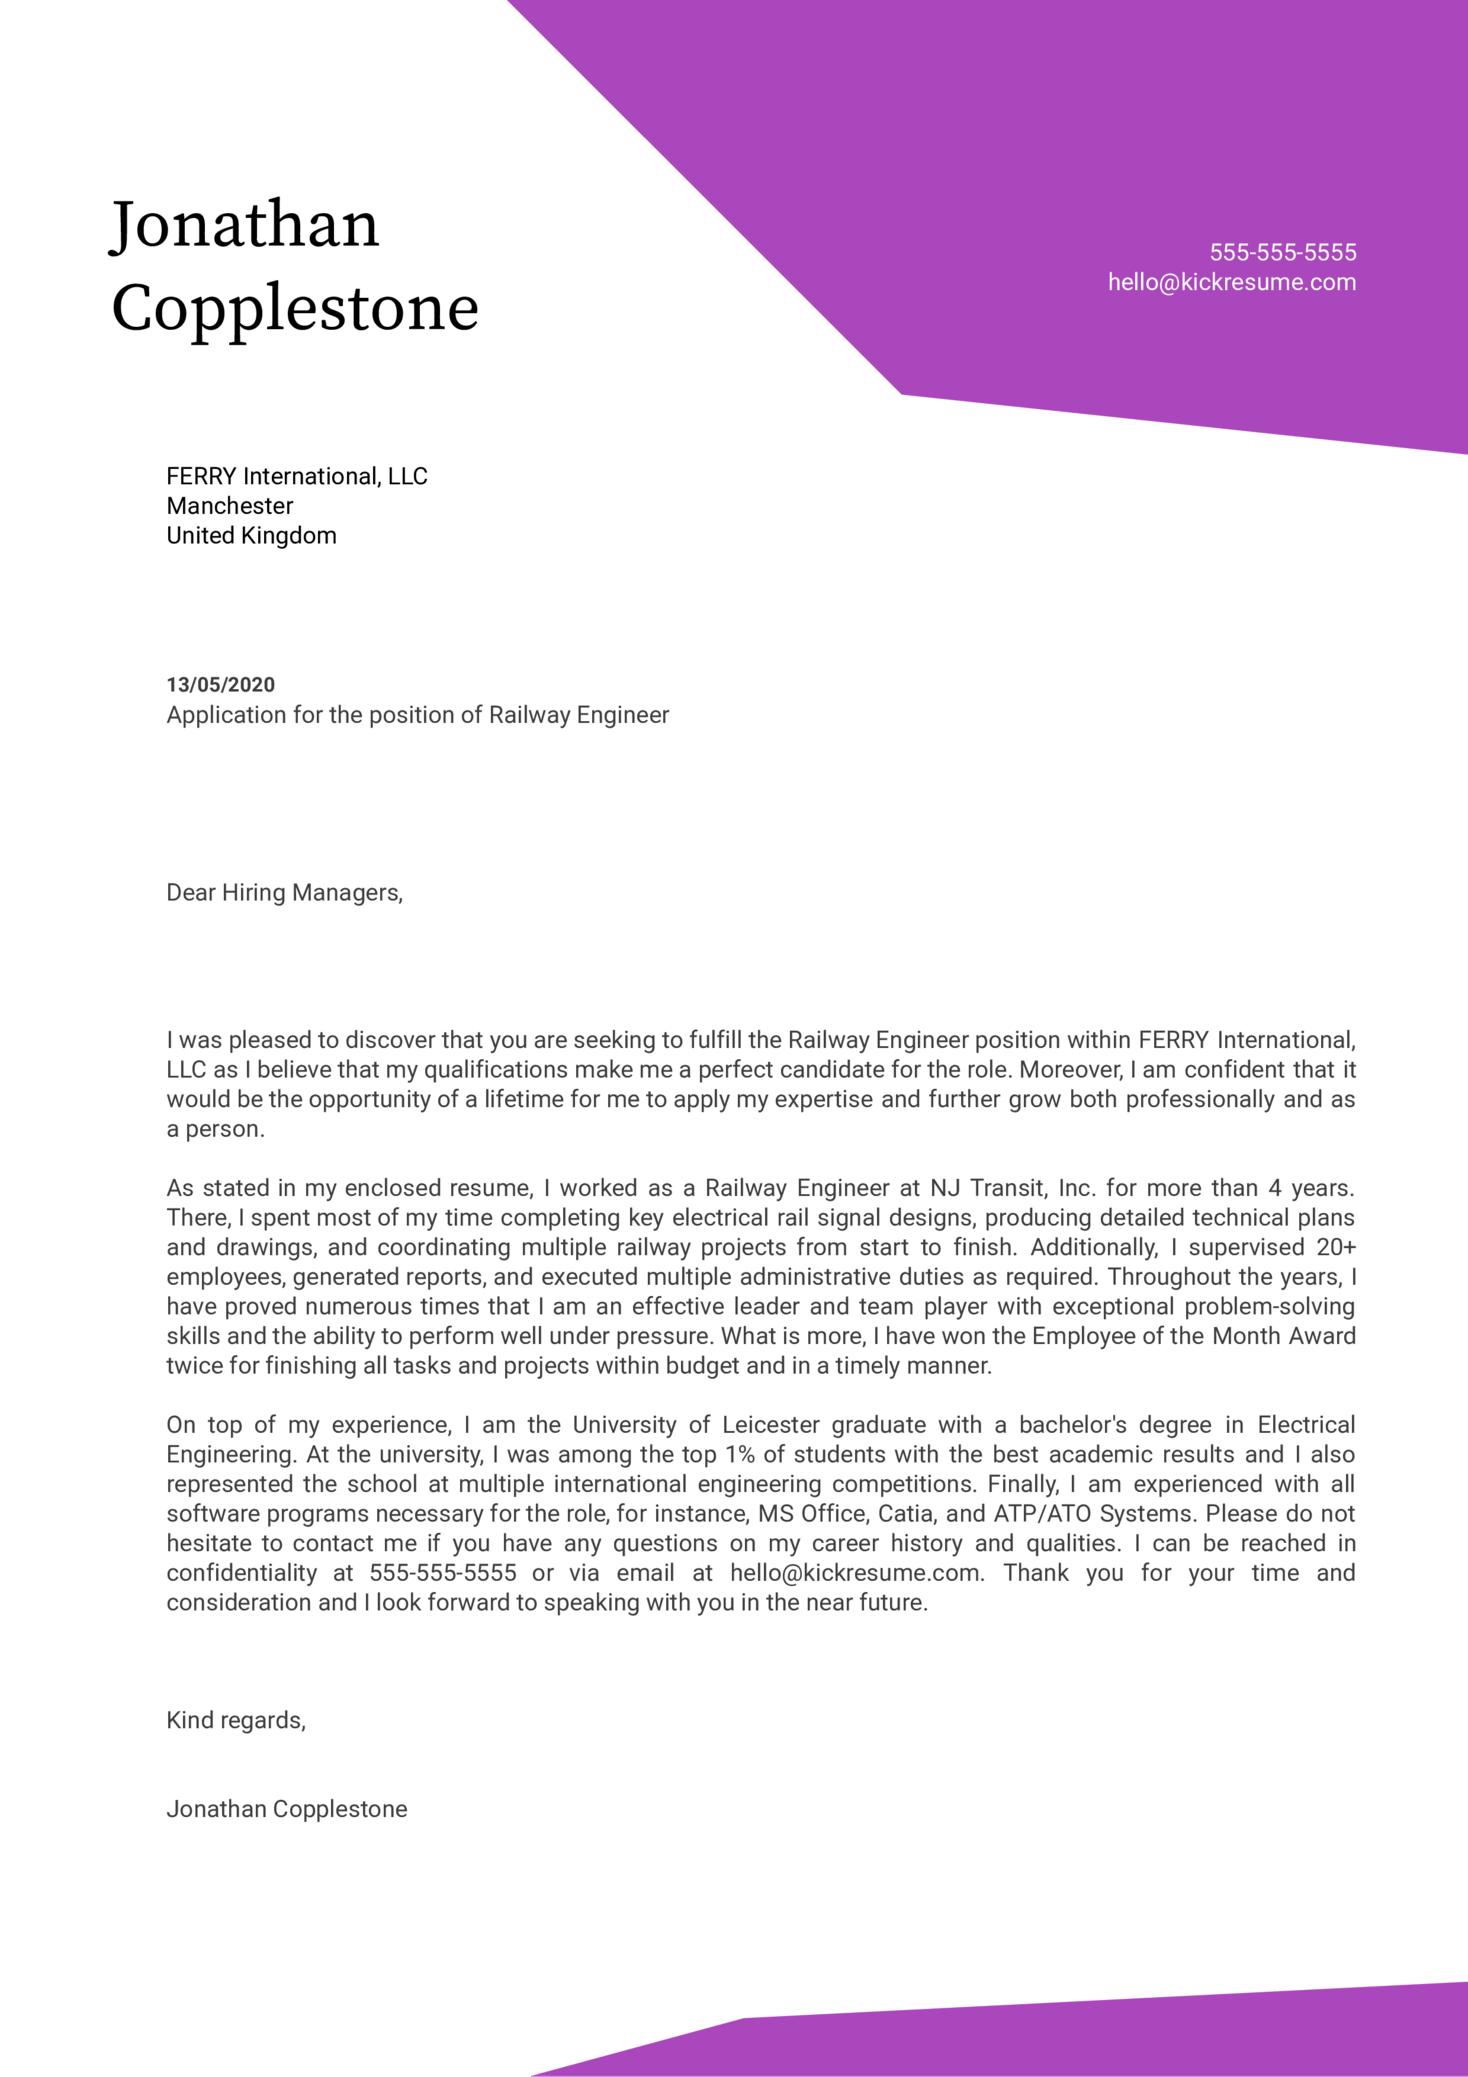 Railway Engineer Cover Letter Sample